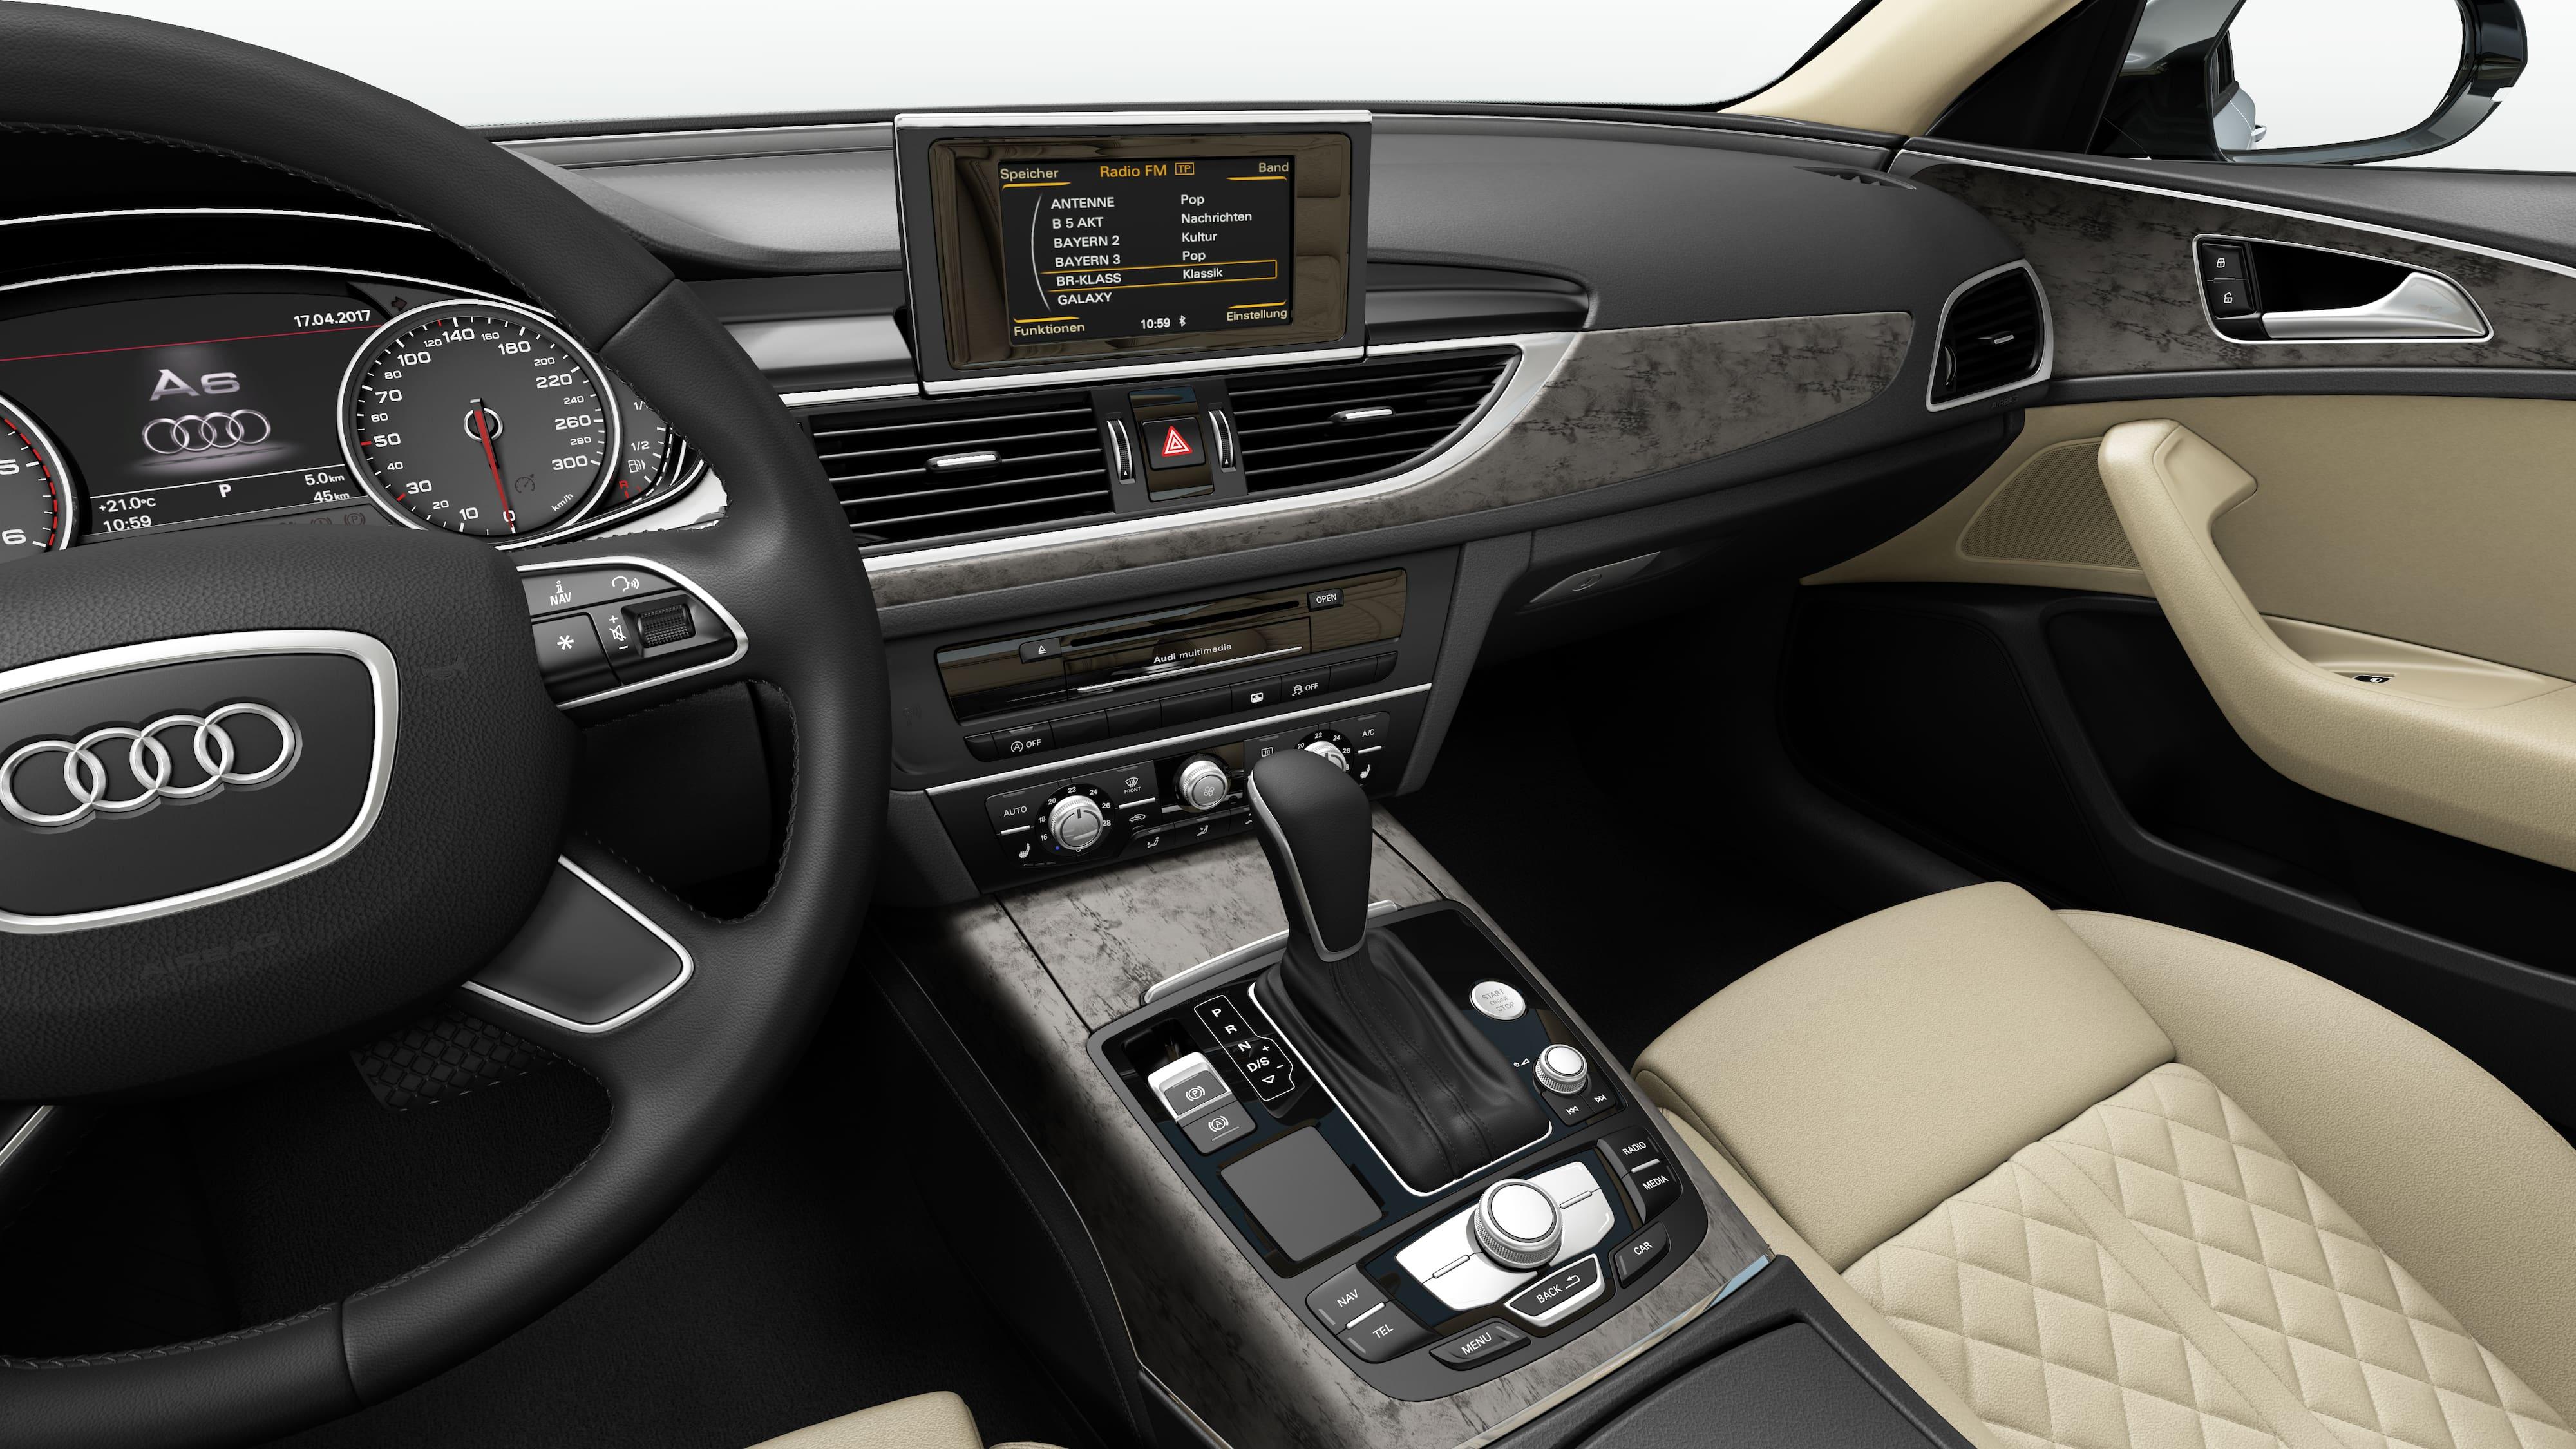 event pricing sales tron sportback e usa auto archives audi world category news exterior etron